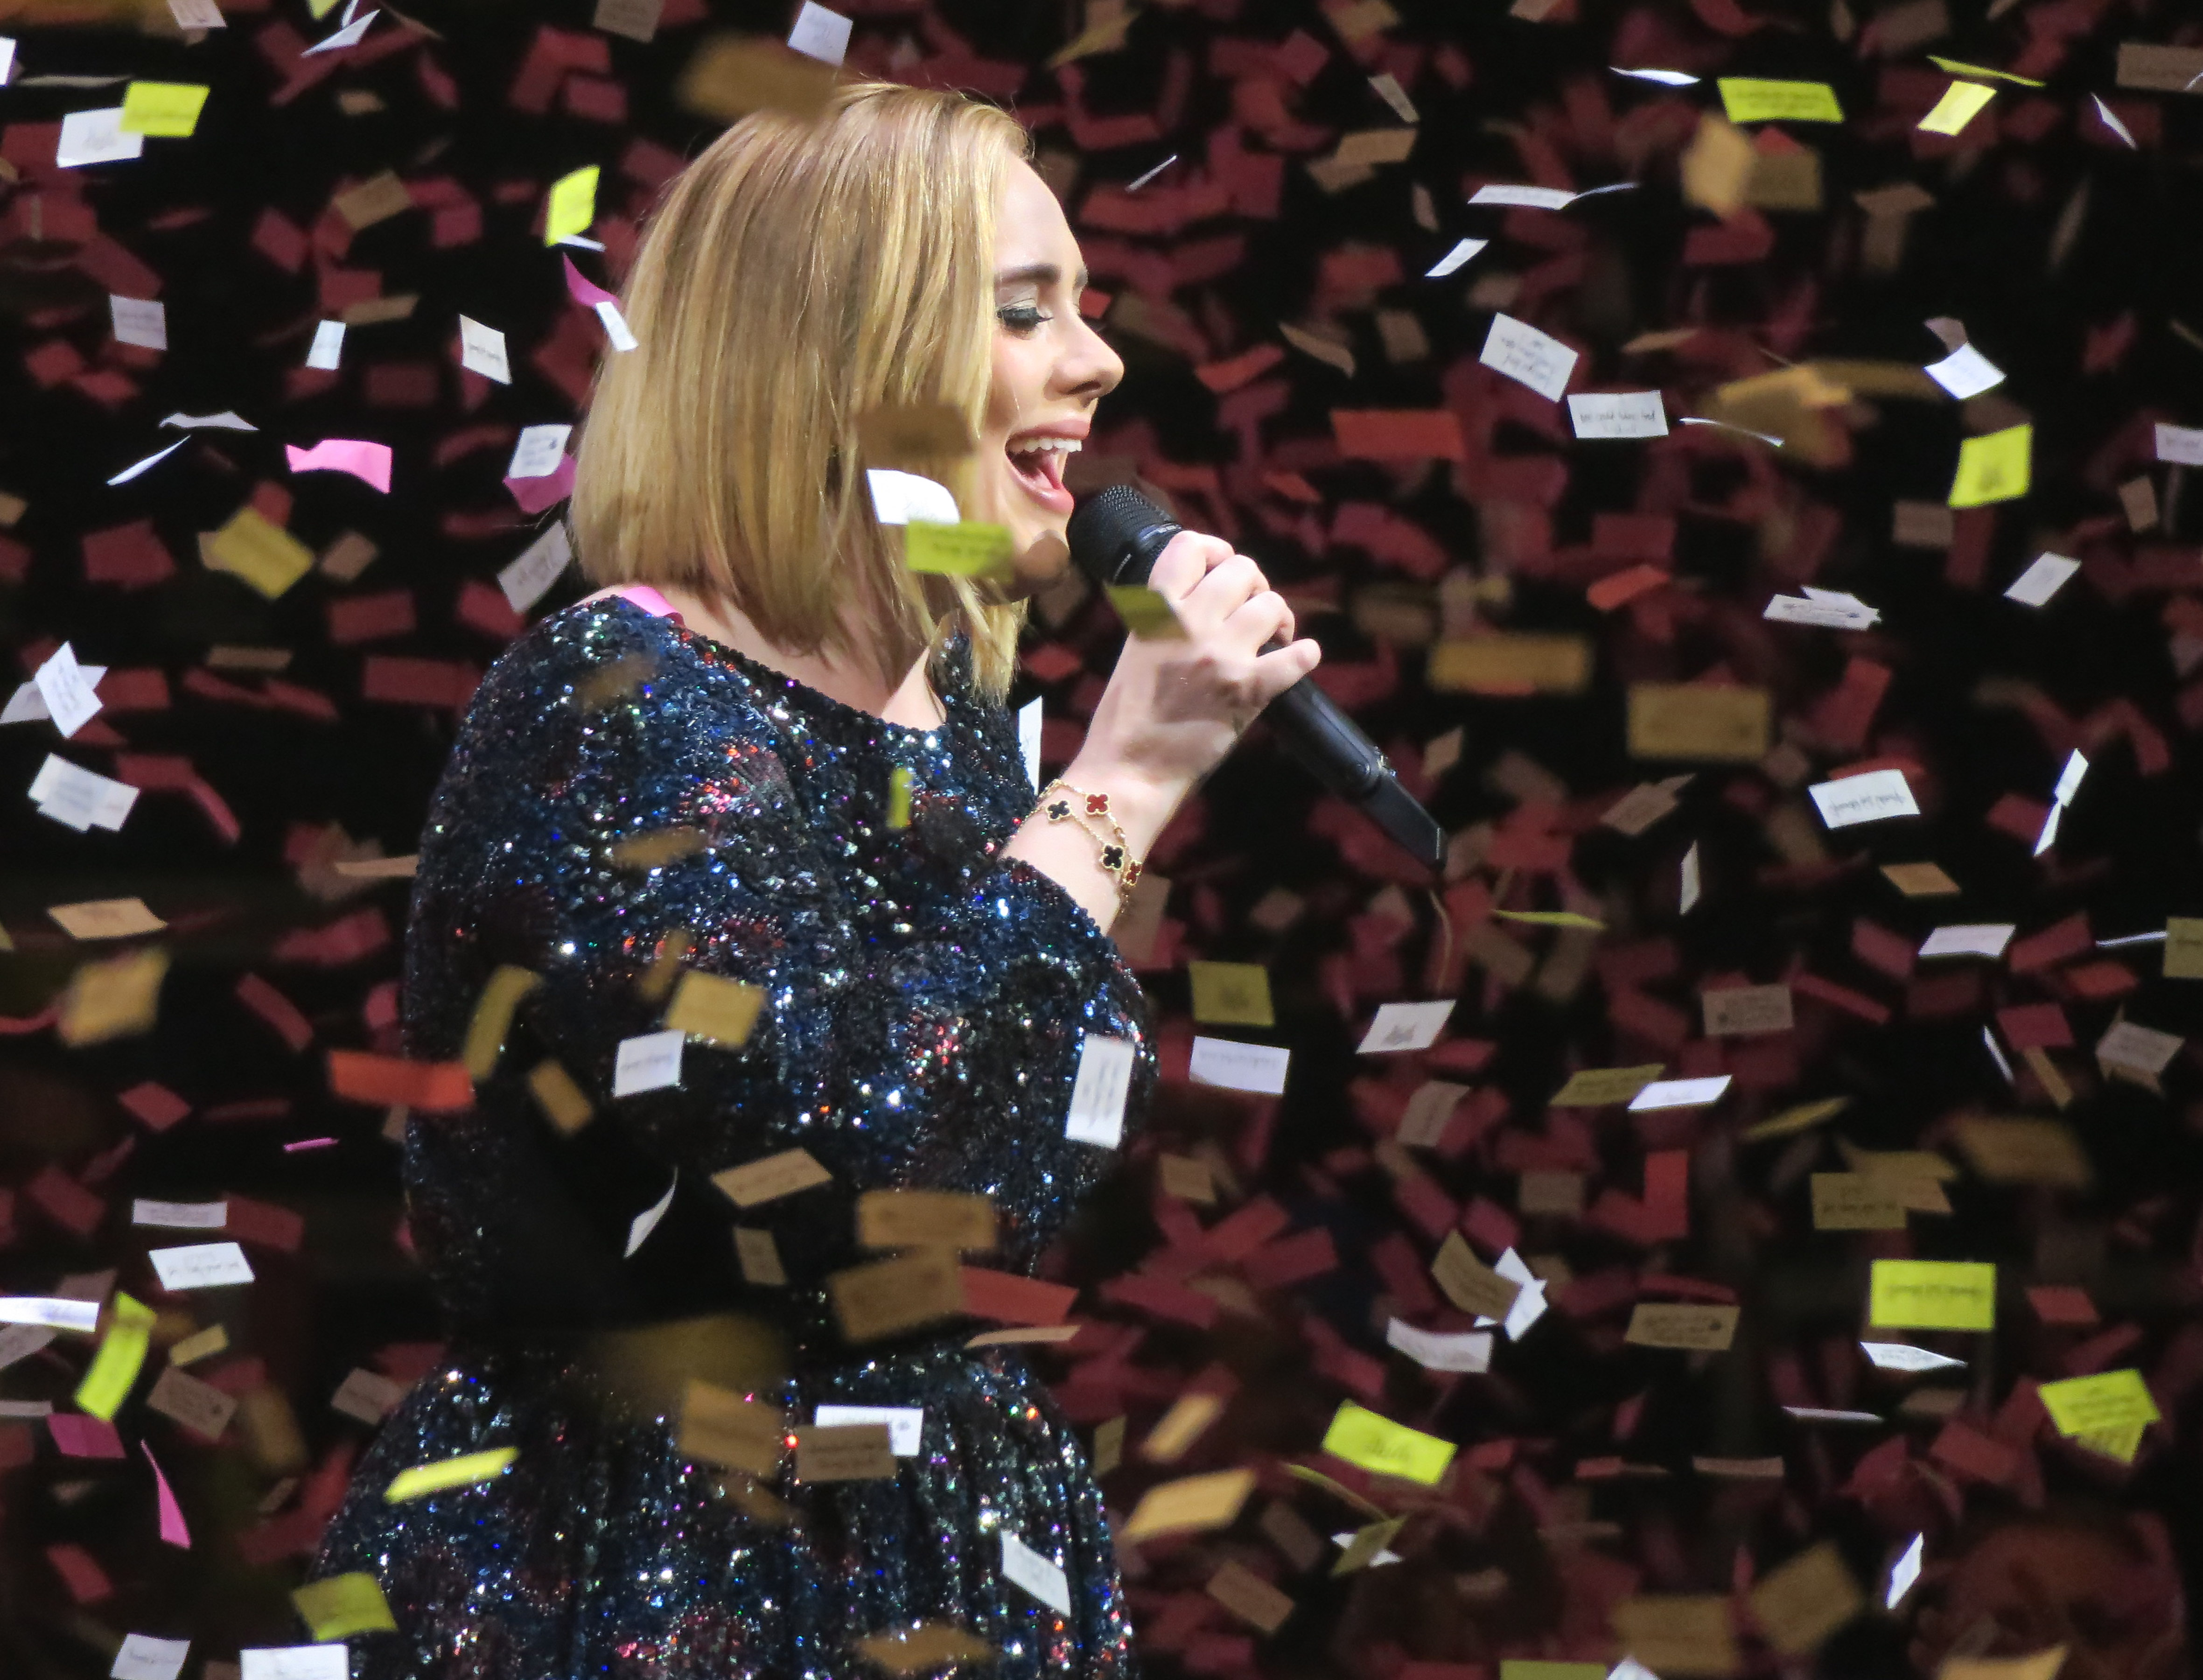 Adele and the confetti